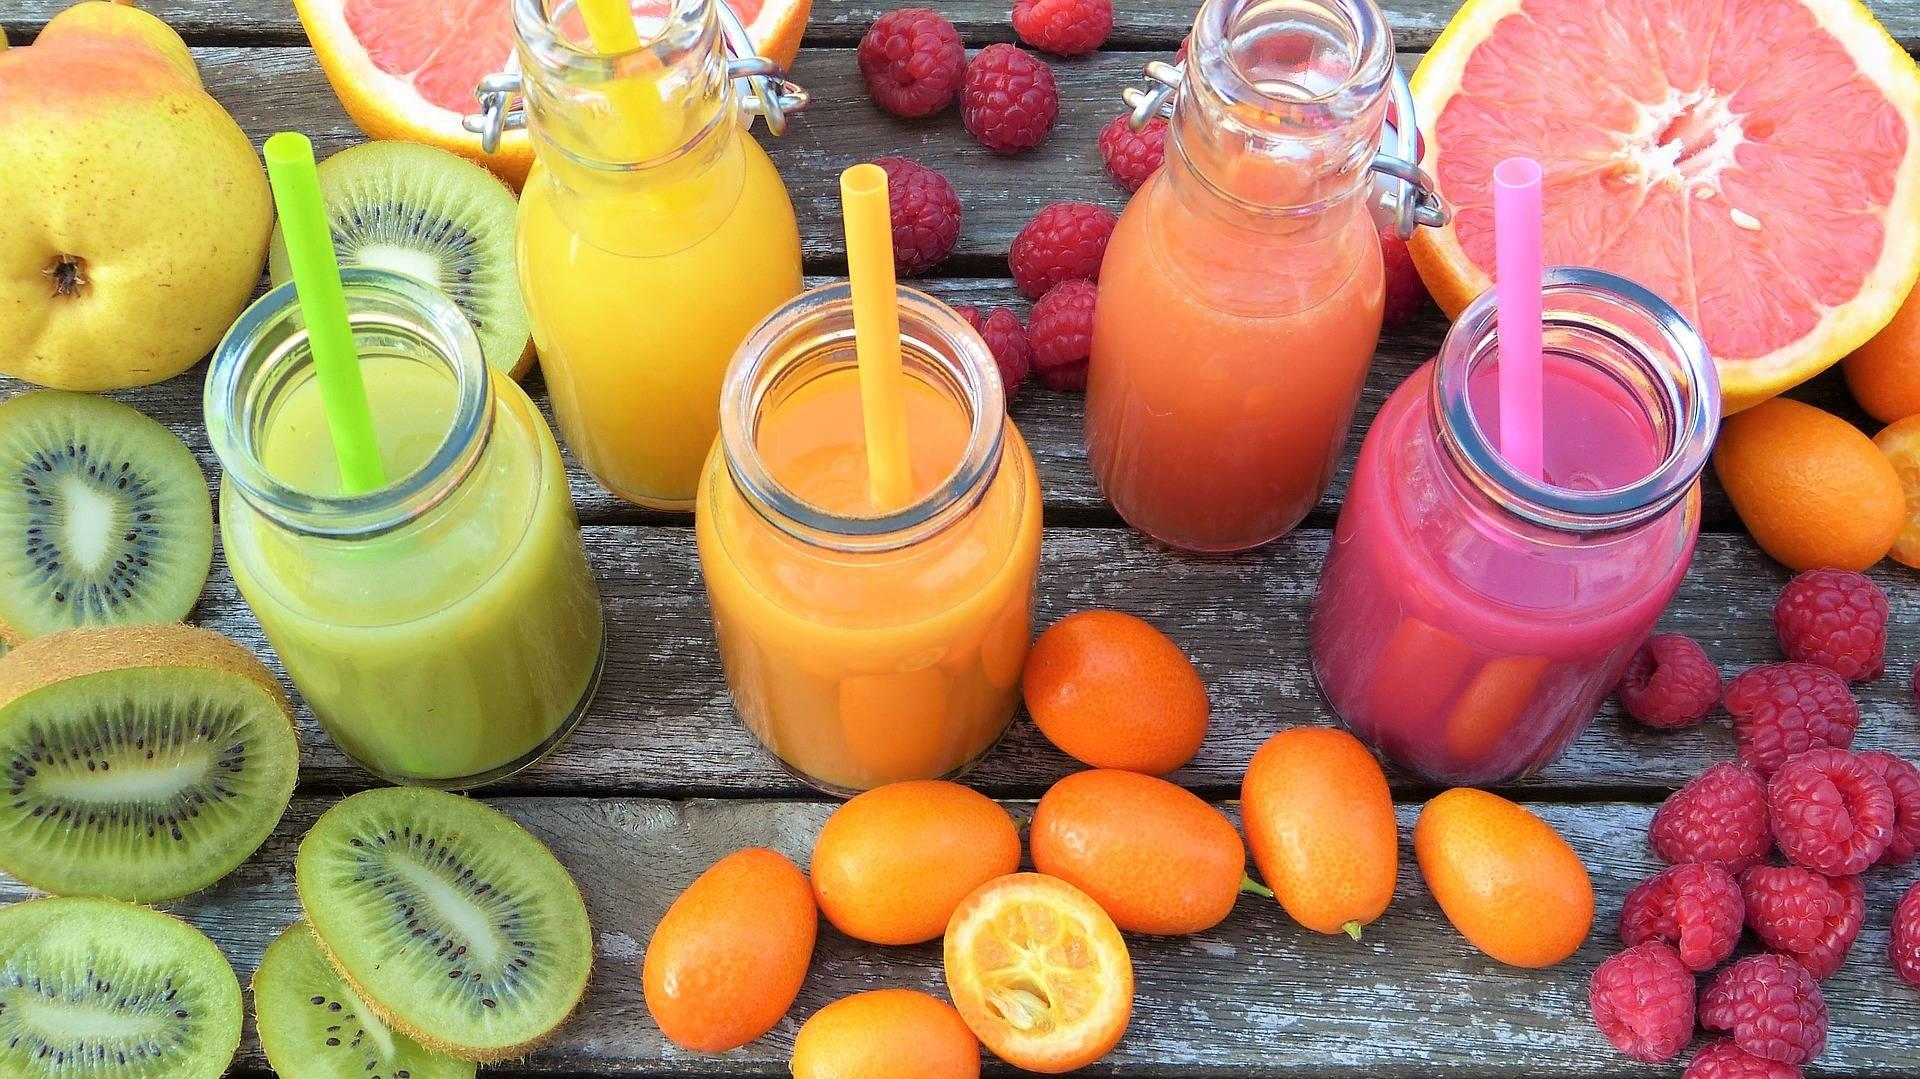 Immunity Boosting Smoothie Recipes for Fall l The Community Hub l Mukha Yoga